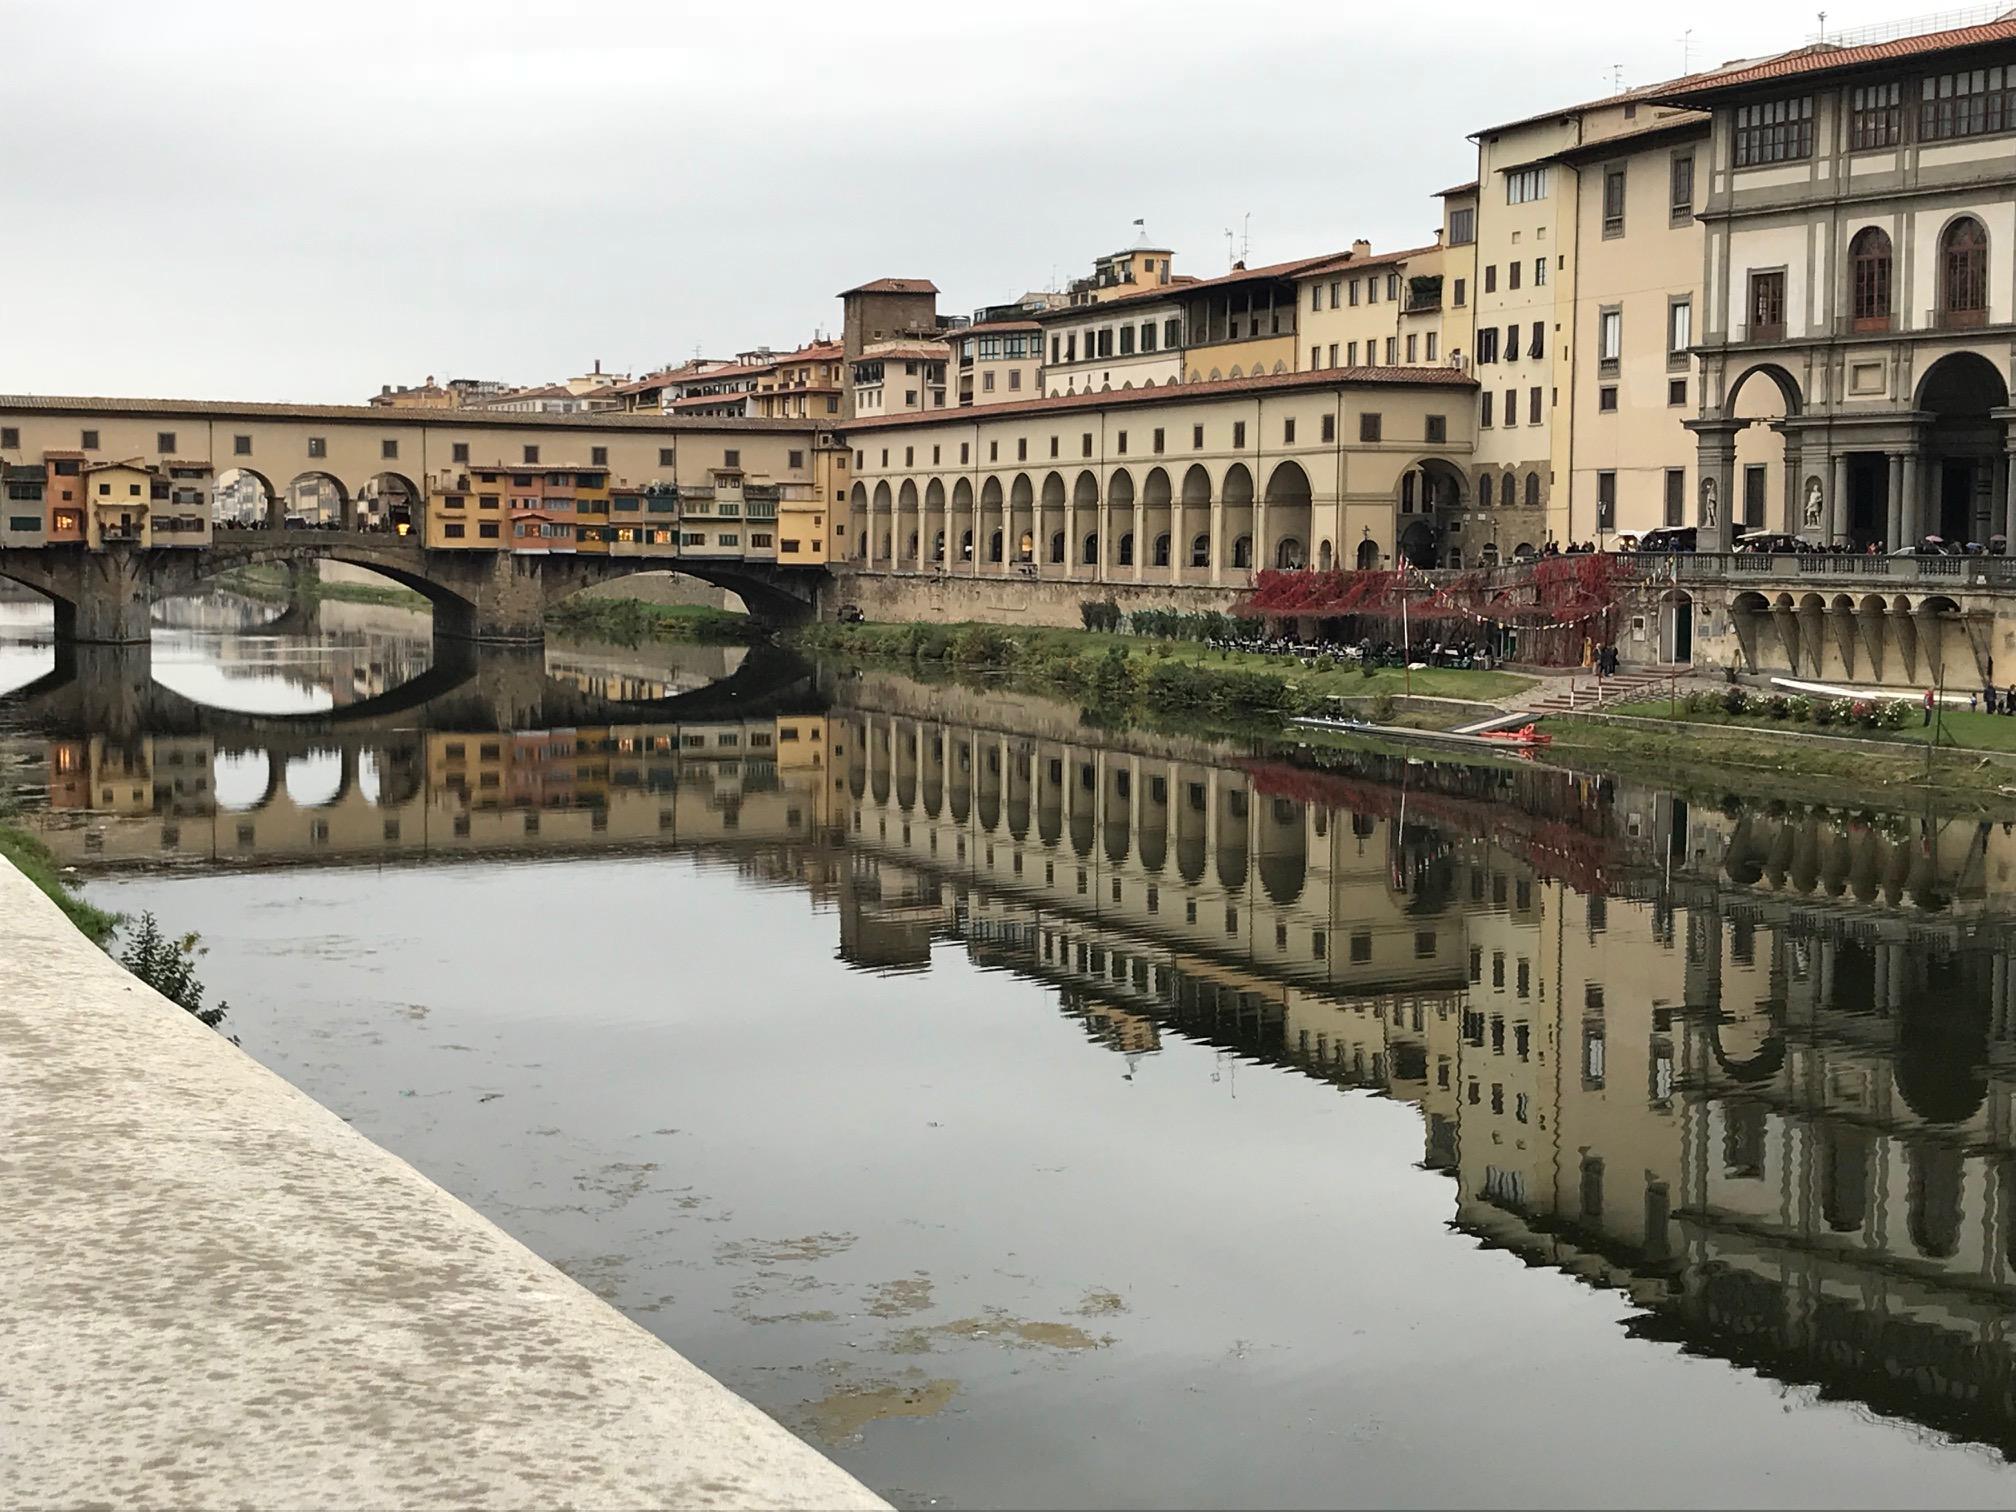 171112 Firenze 5.jpg